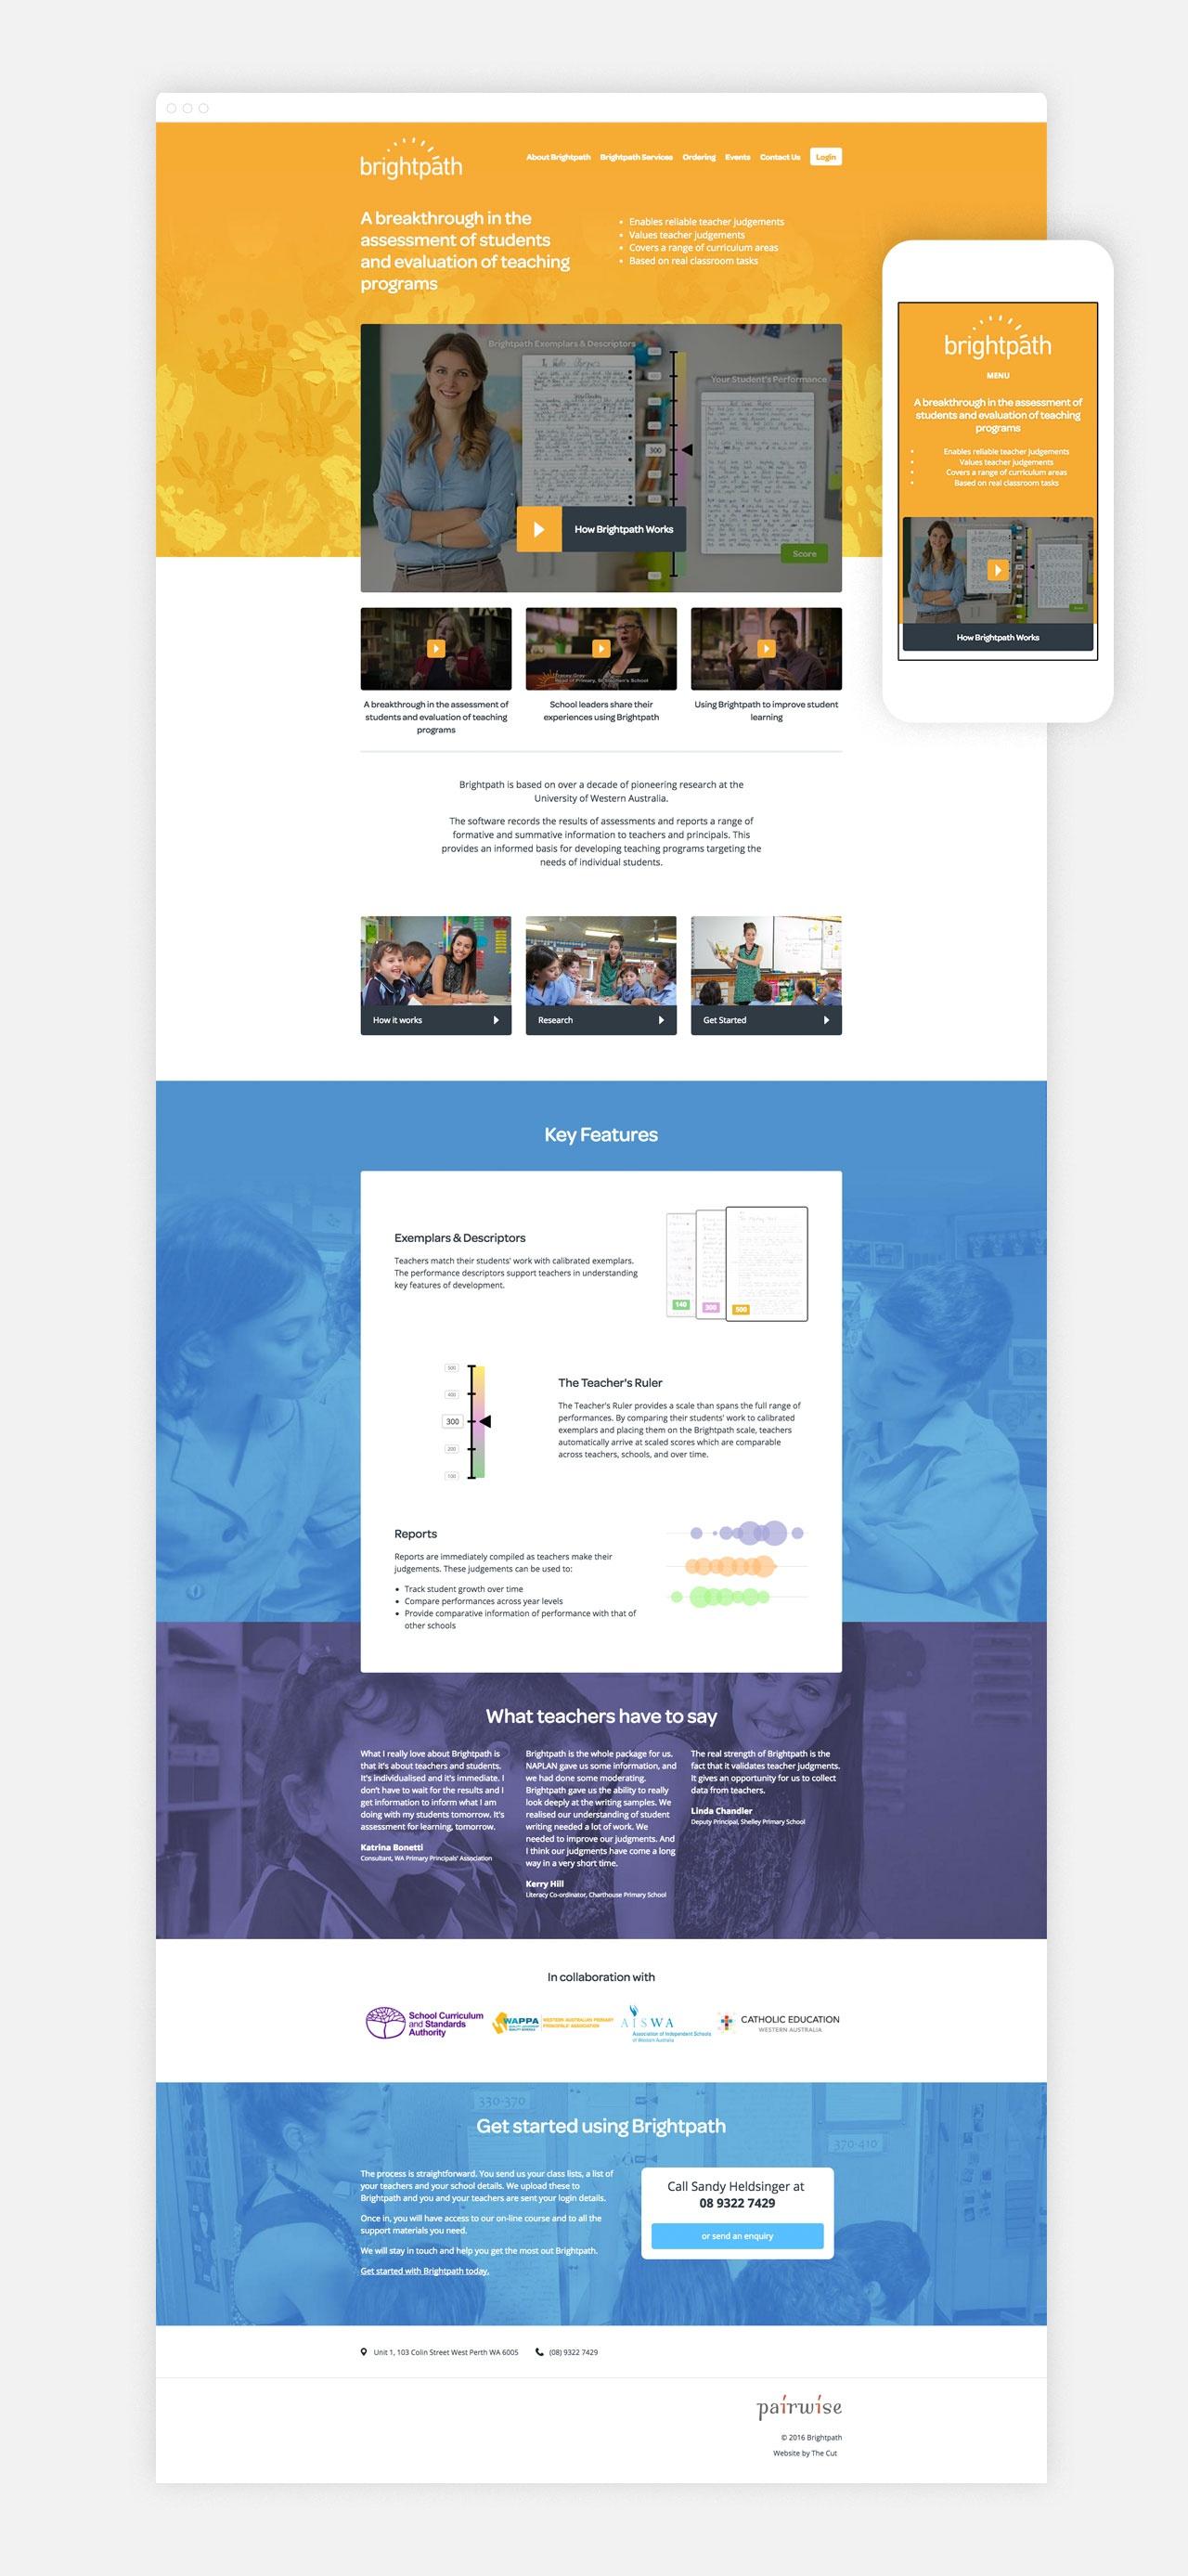 The Brightpath Homepage